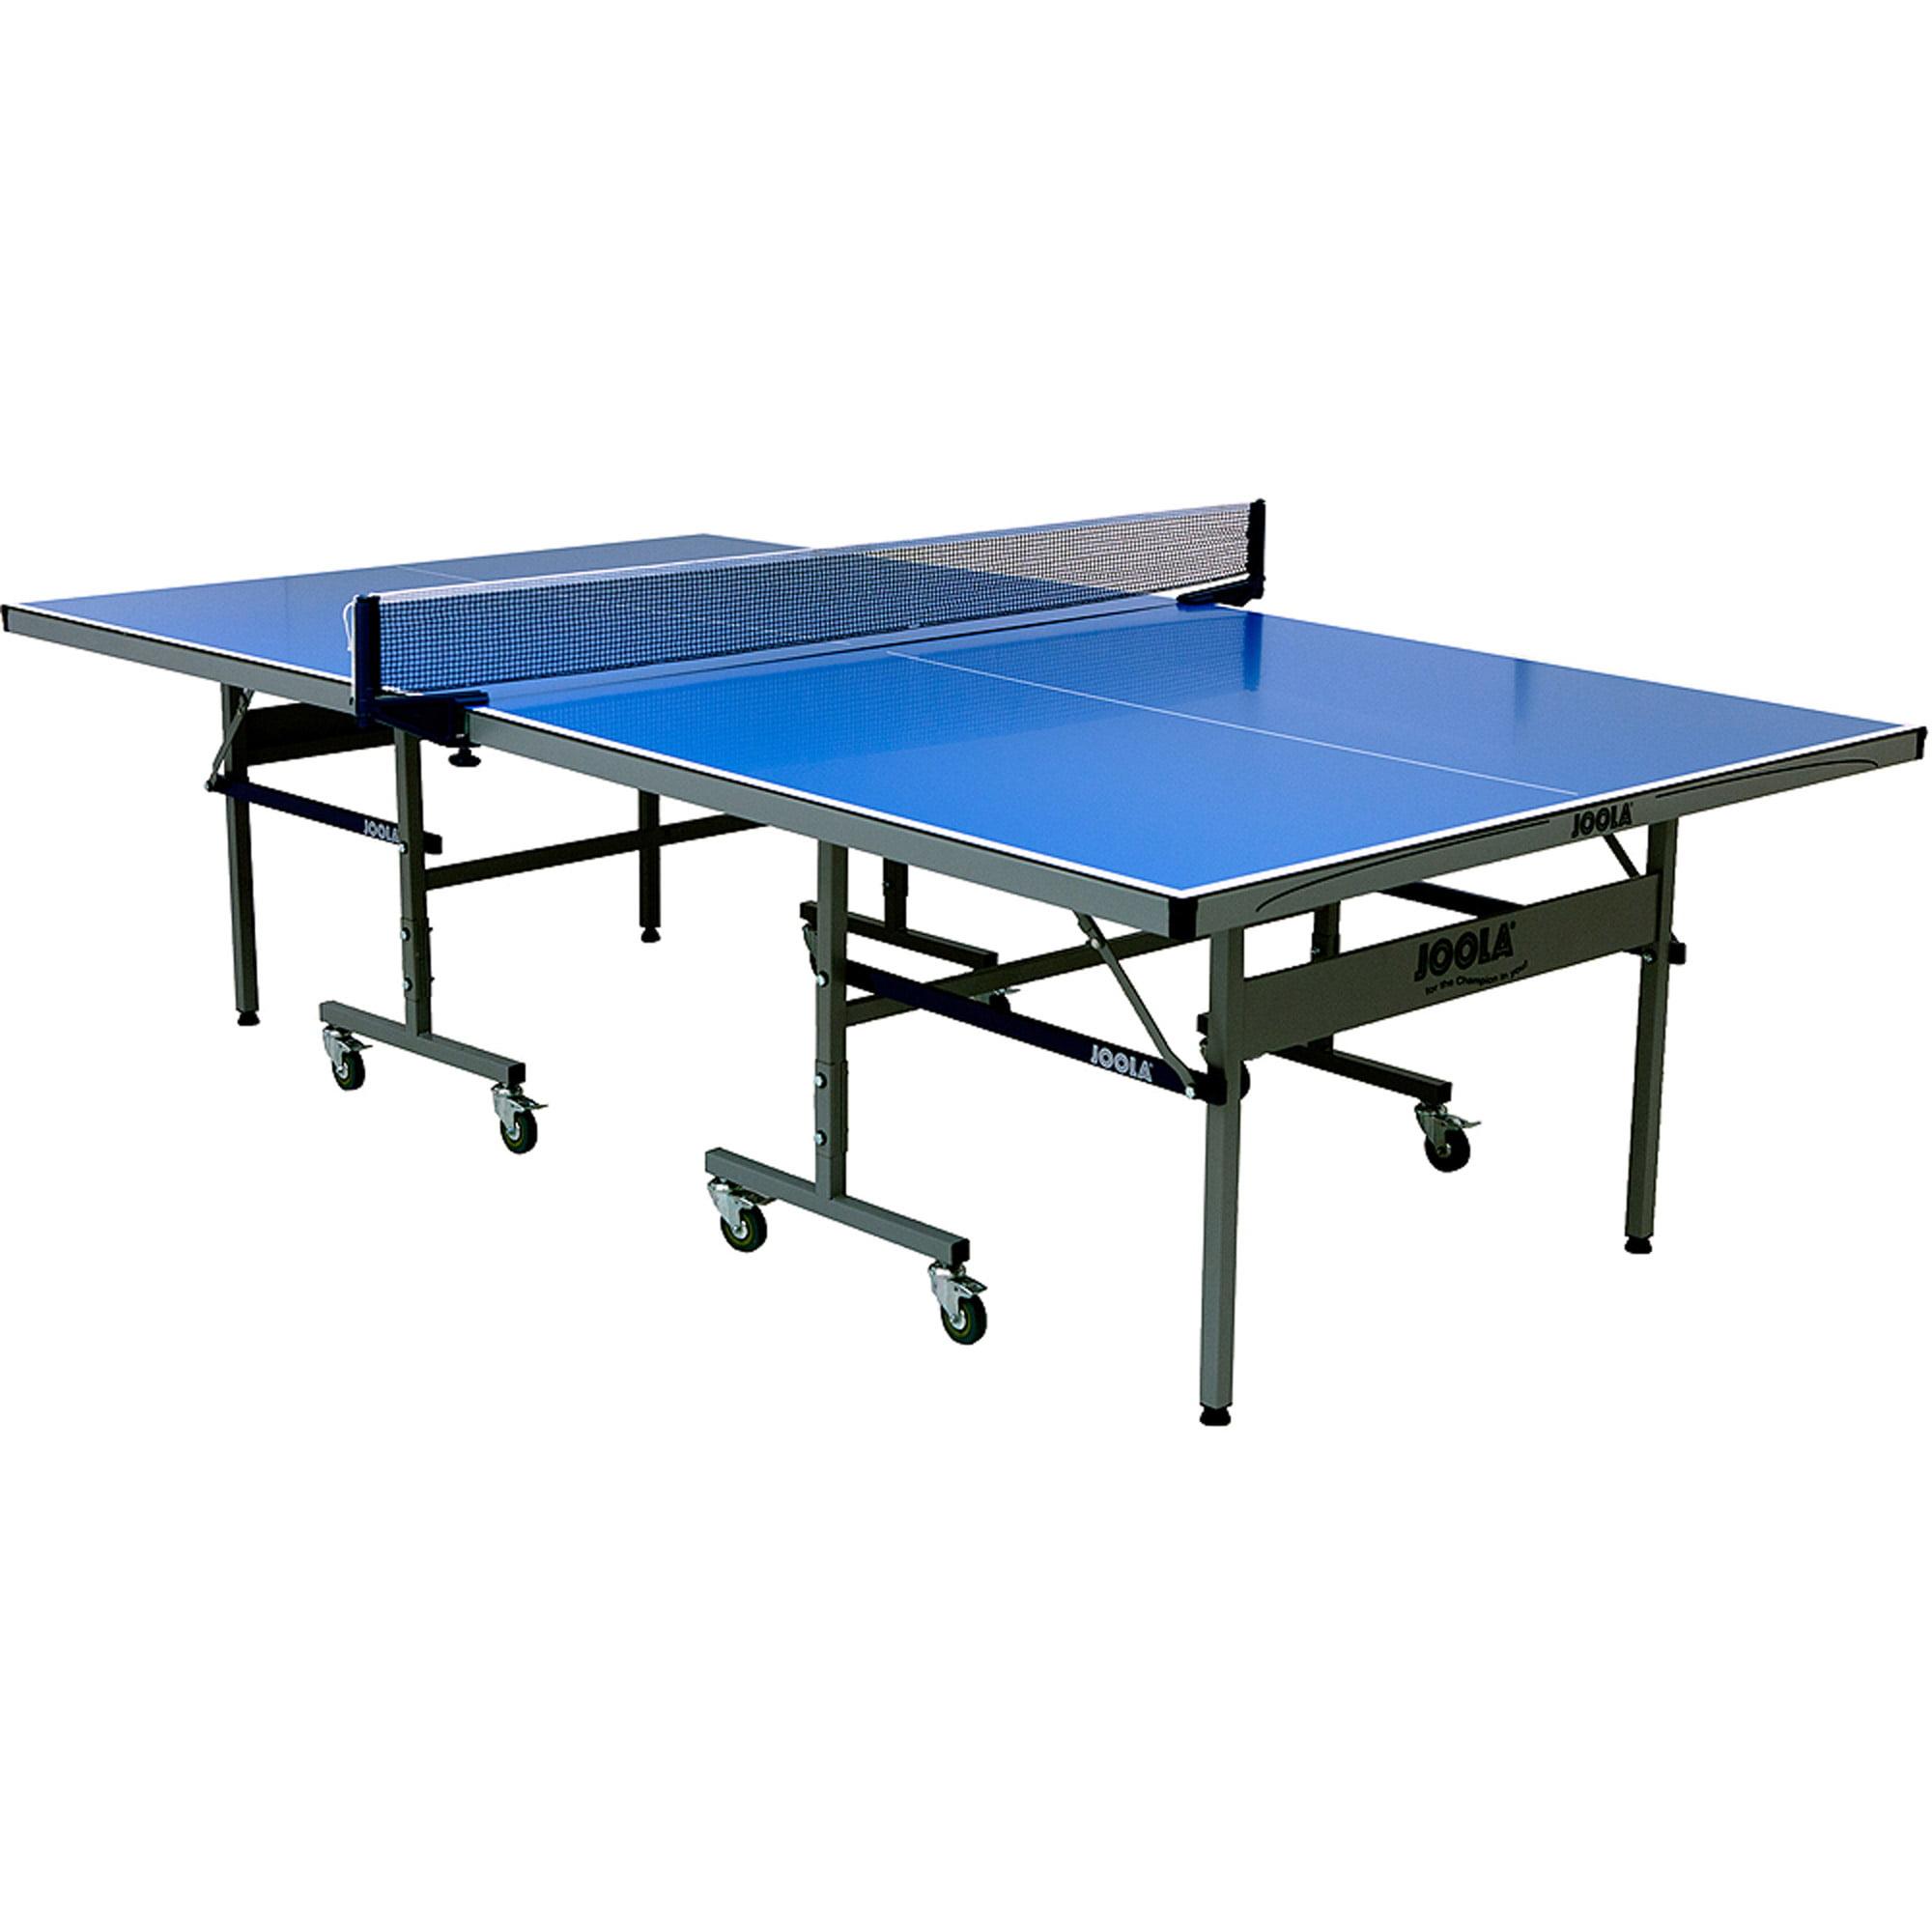 JOOLA Motion Outdoor Table Tennis Table